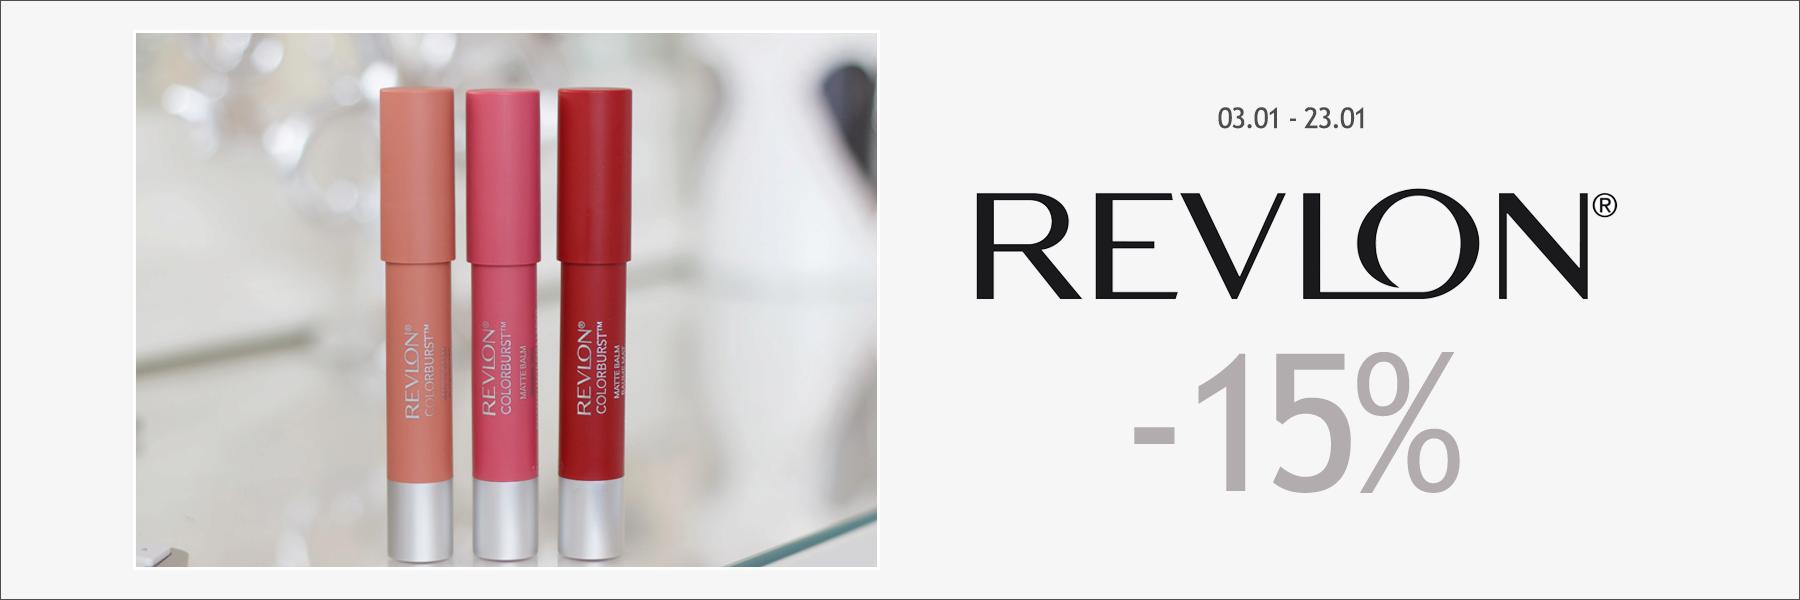 Revlon -15%